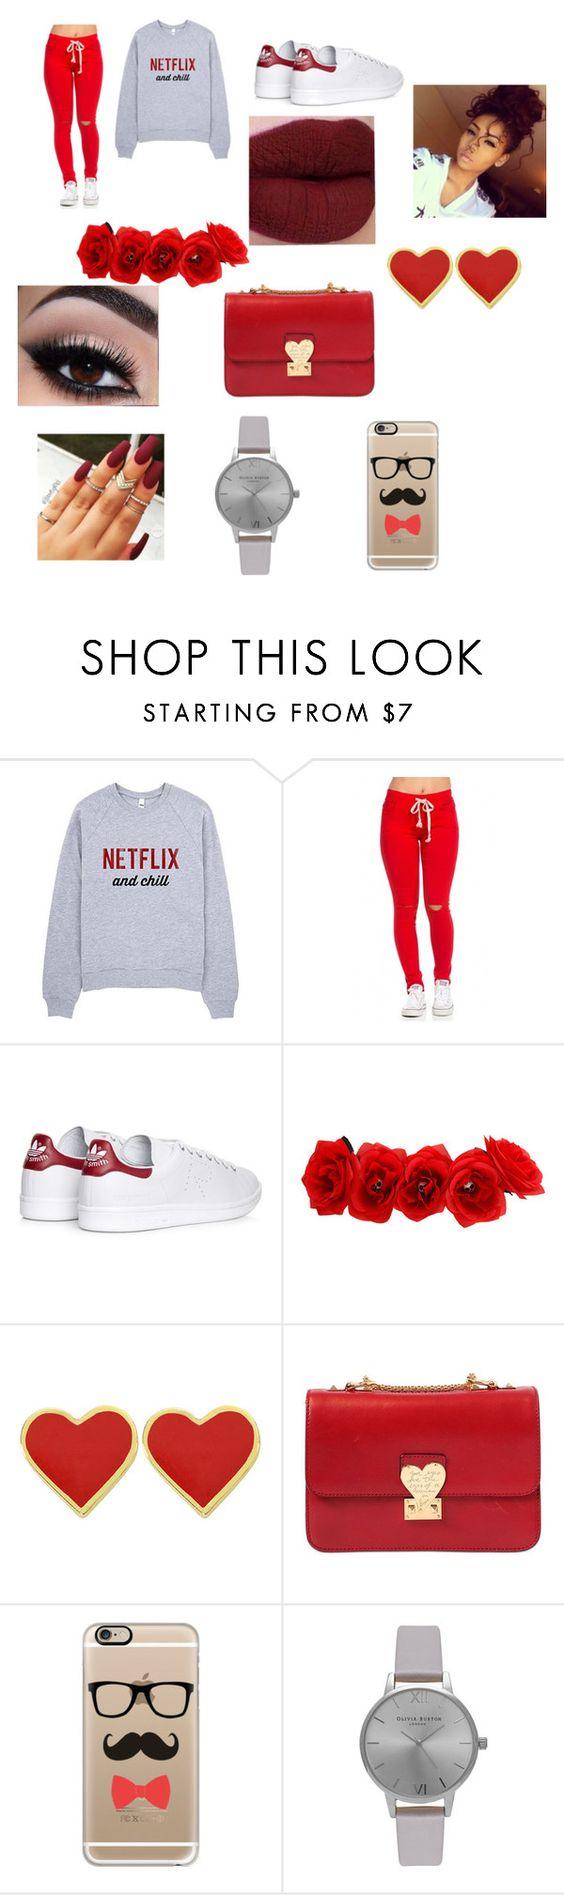 """Netflix"" by goofystar ❤ liked on Polyvore featuring adidas, Valentino, Casetify and Olivia Burton"